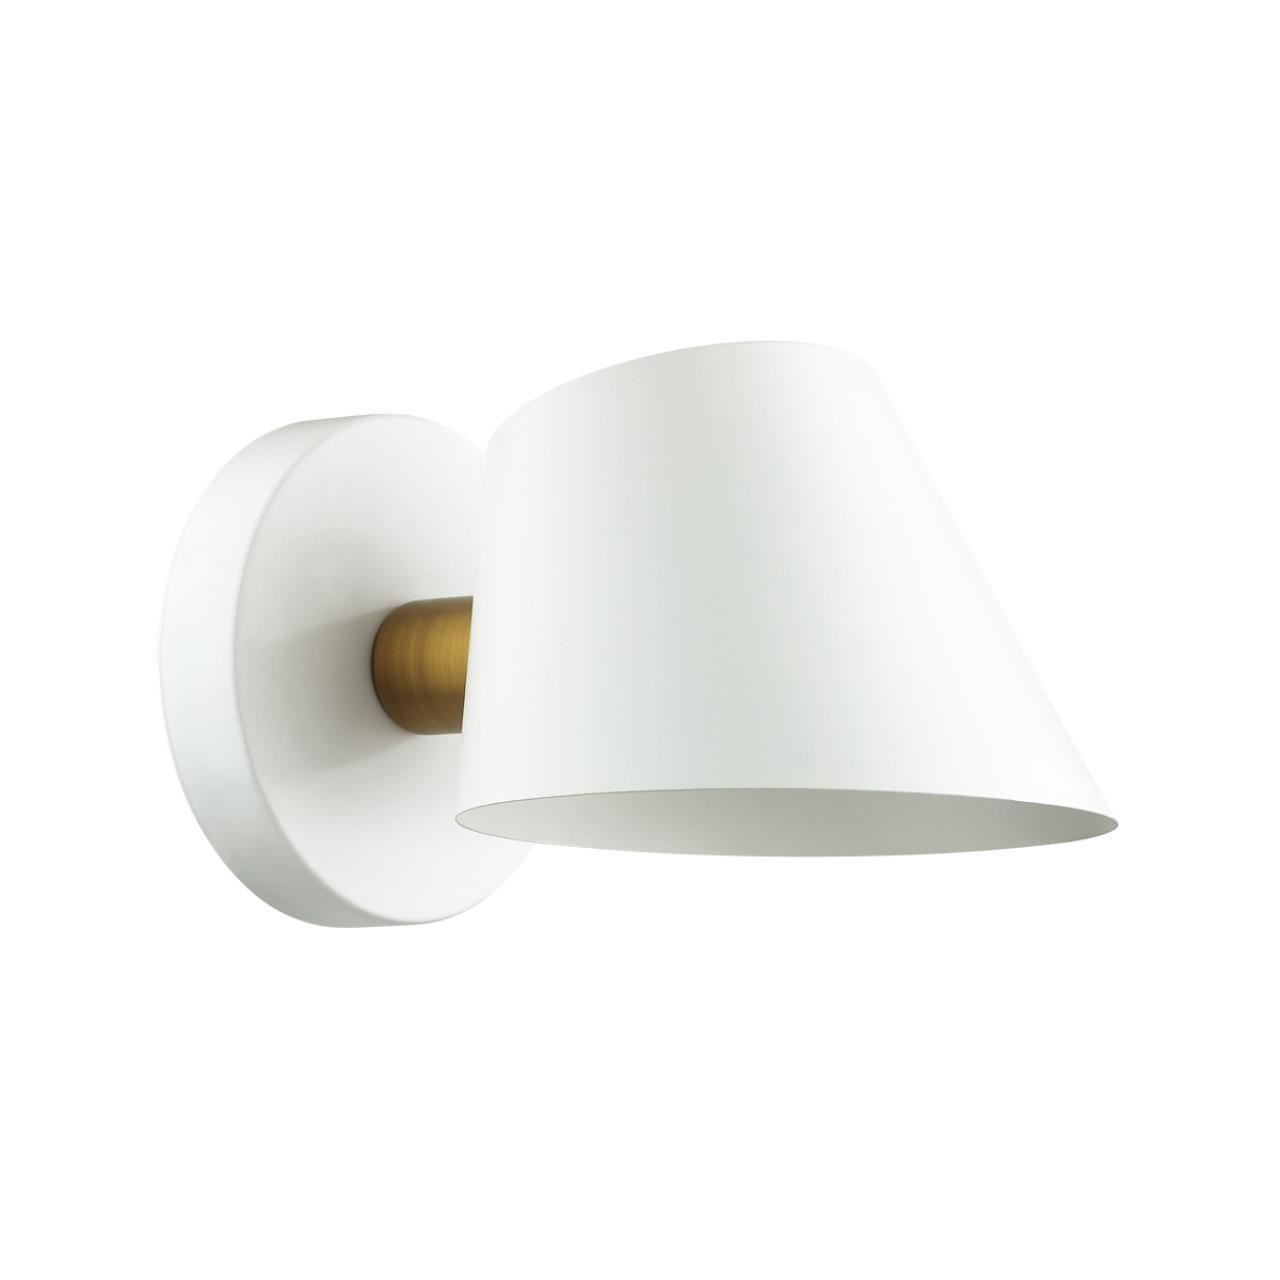 4465/1W MODERNI LN20 54 белый, золотой Бра E14 1*60W 220V KENIA